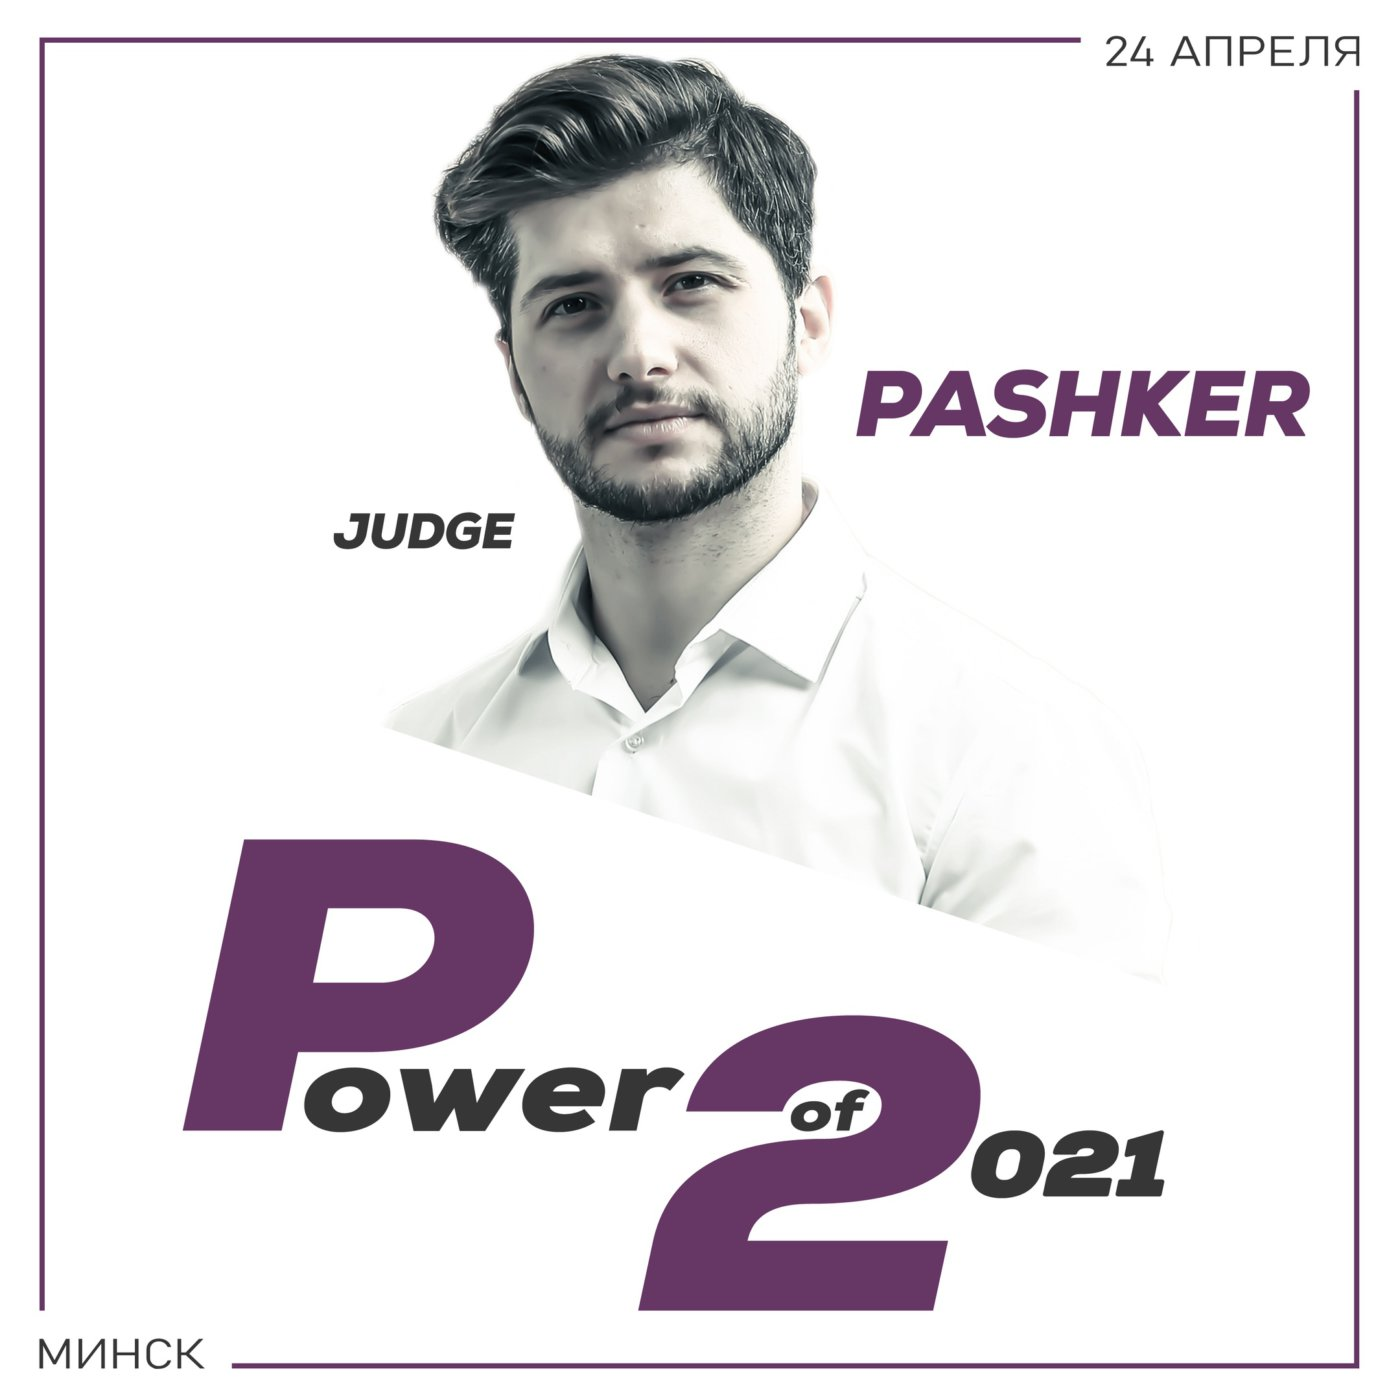 Тренер Брейк-Данс центра - один из судей фестиваля Power of 2